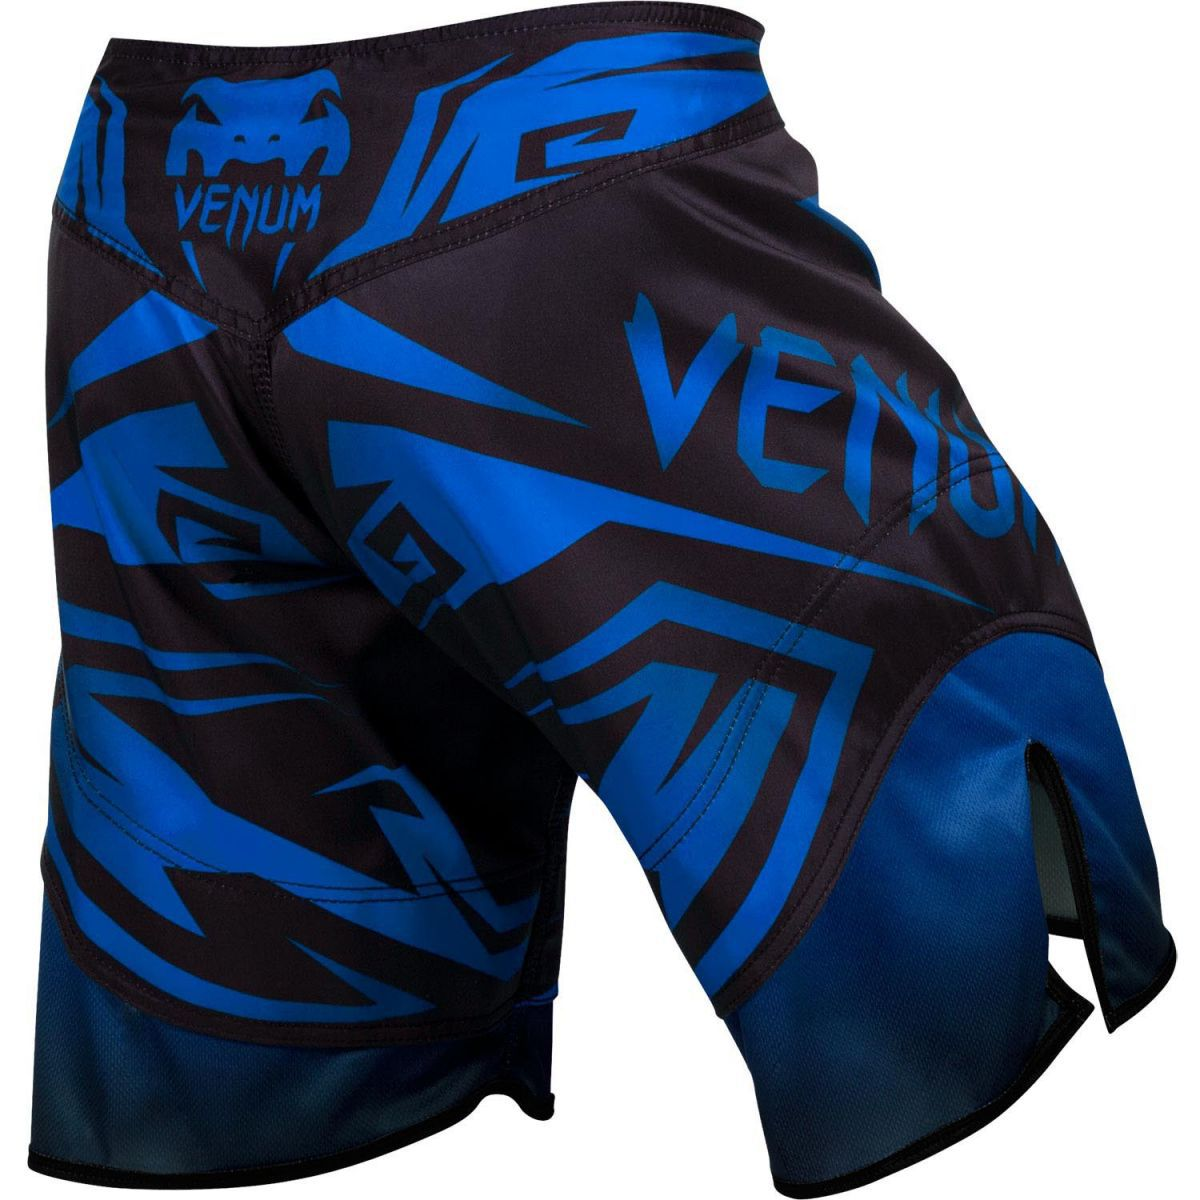 Bermuda MMA - Shadow Hunter- Preto/Azul- Venum  - Loja do Competidor